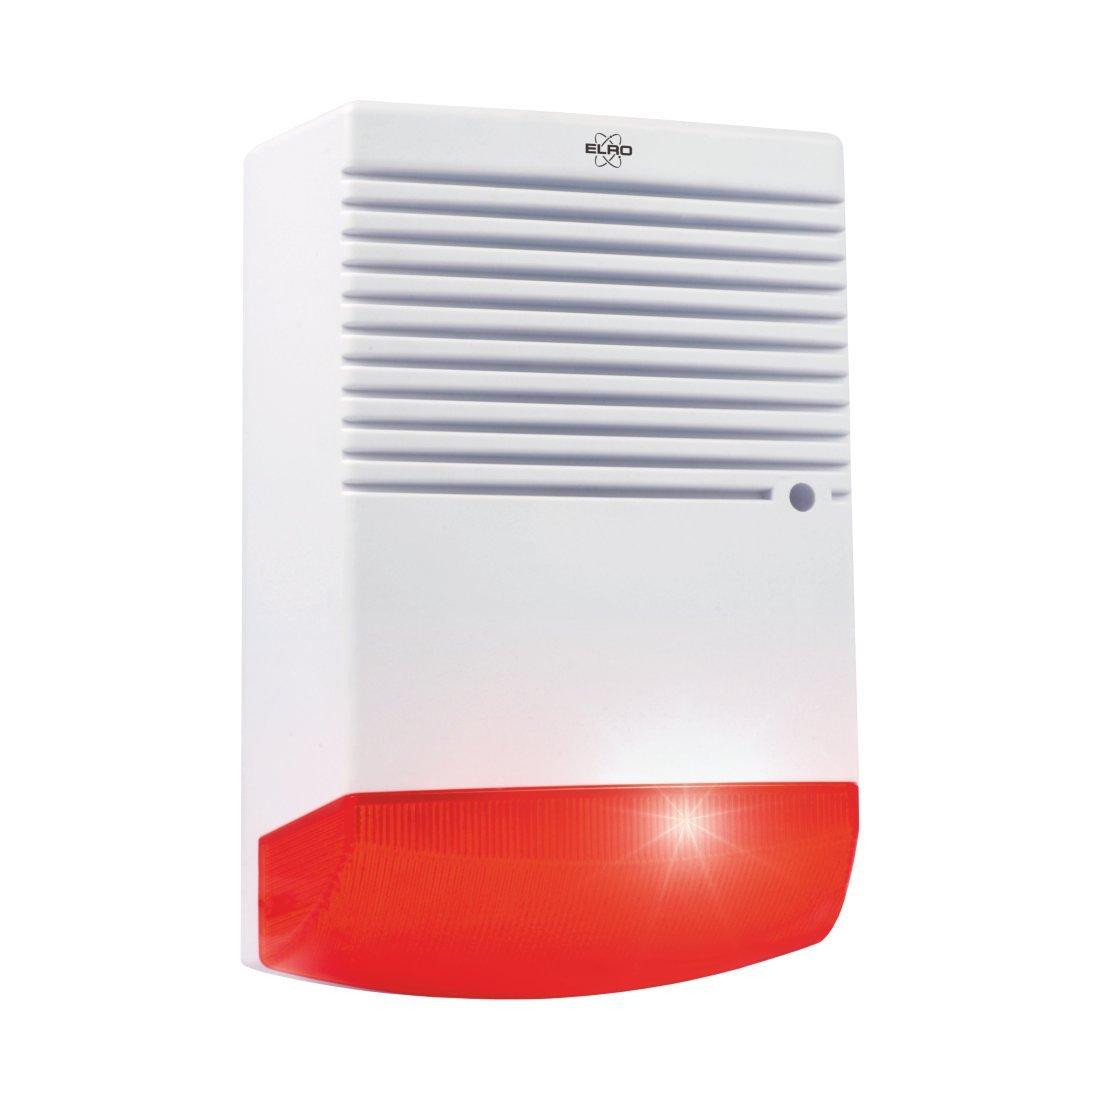 ELRO ADS1F Dummy Alarmsirene mit blinkendem LED-Licht ELRO Europe